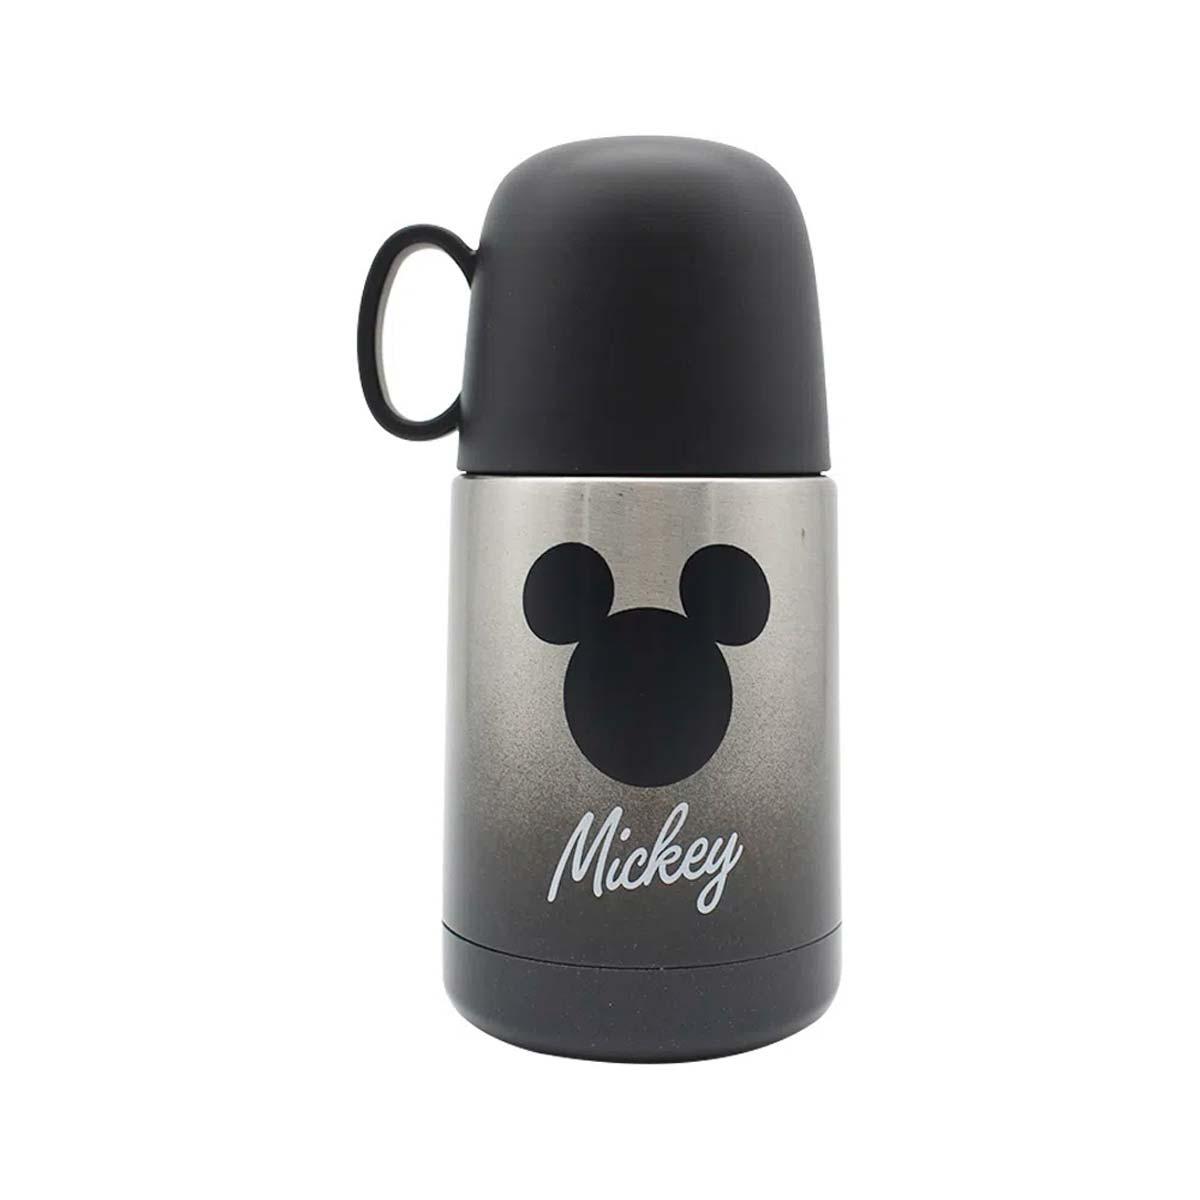 Mini Garrafa com Caneca Mickey Silhueta 210 ml - Presente Super